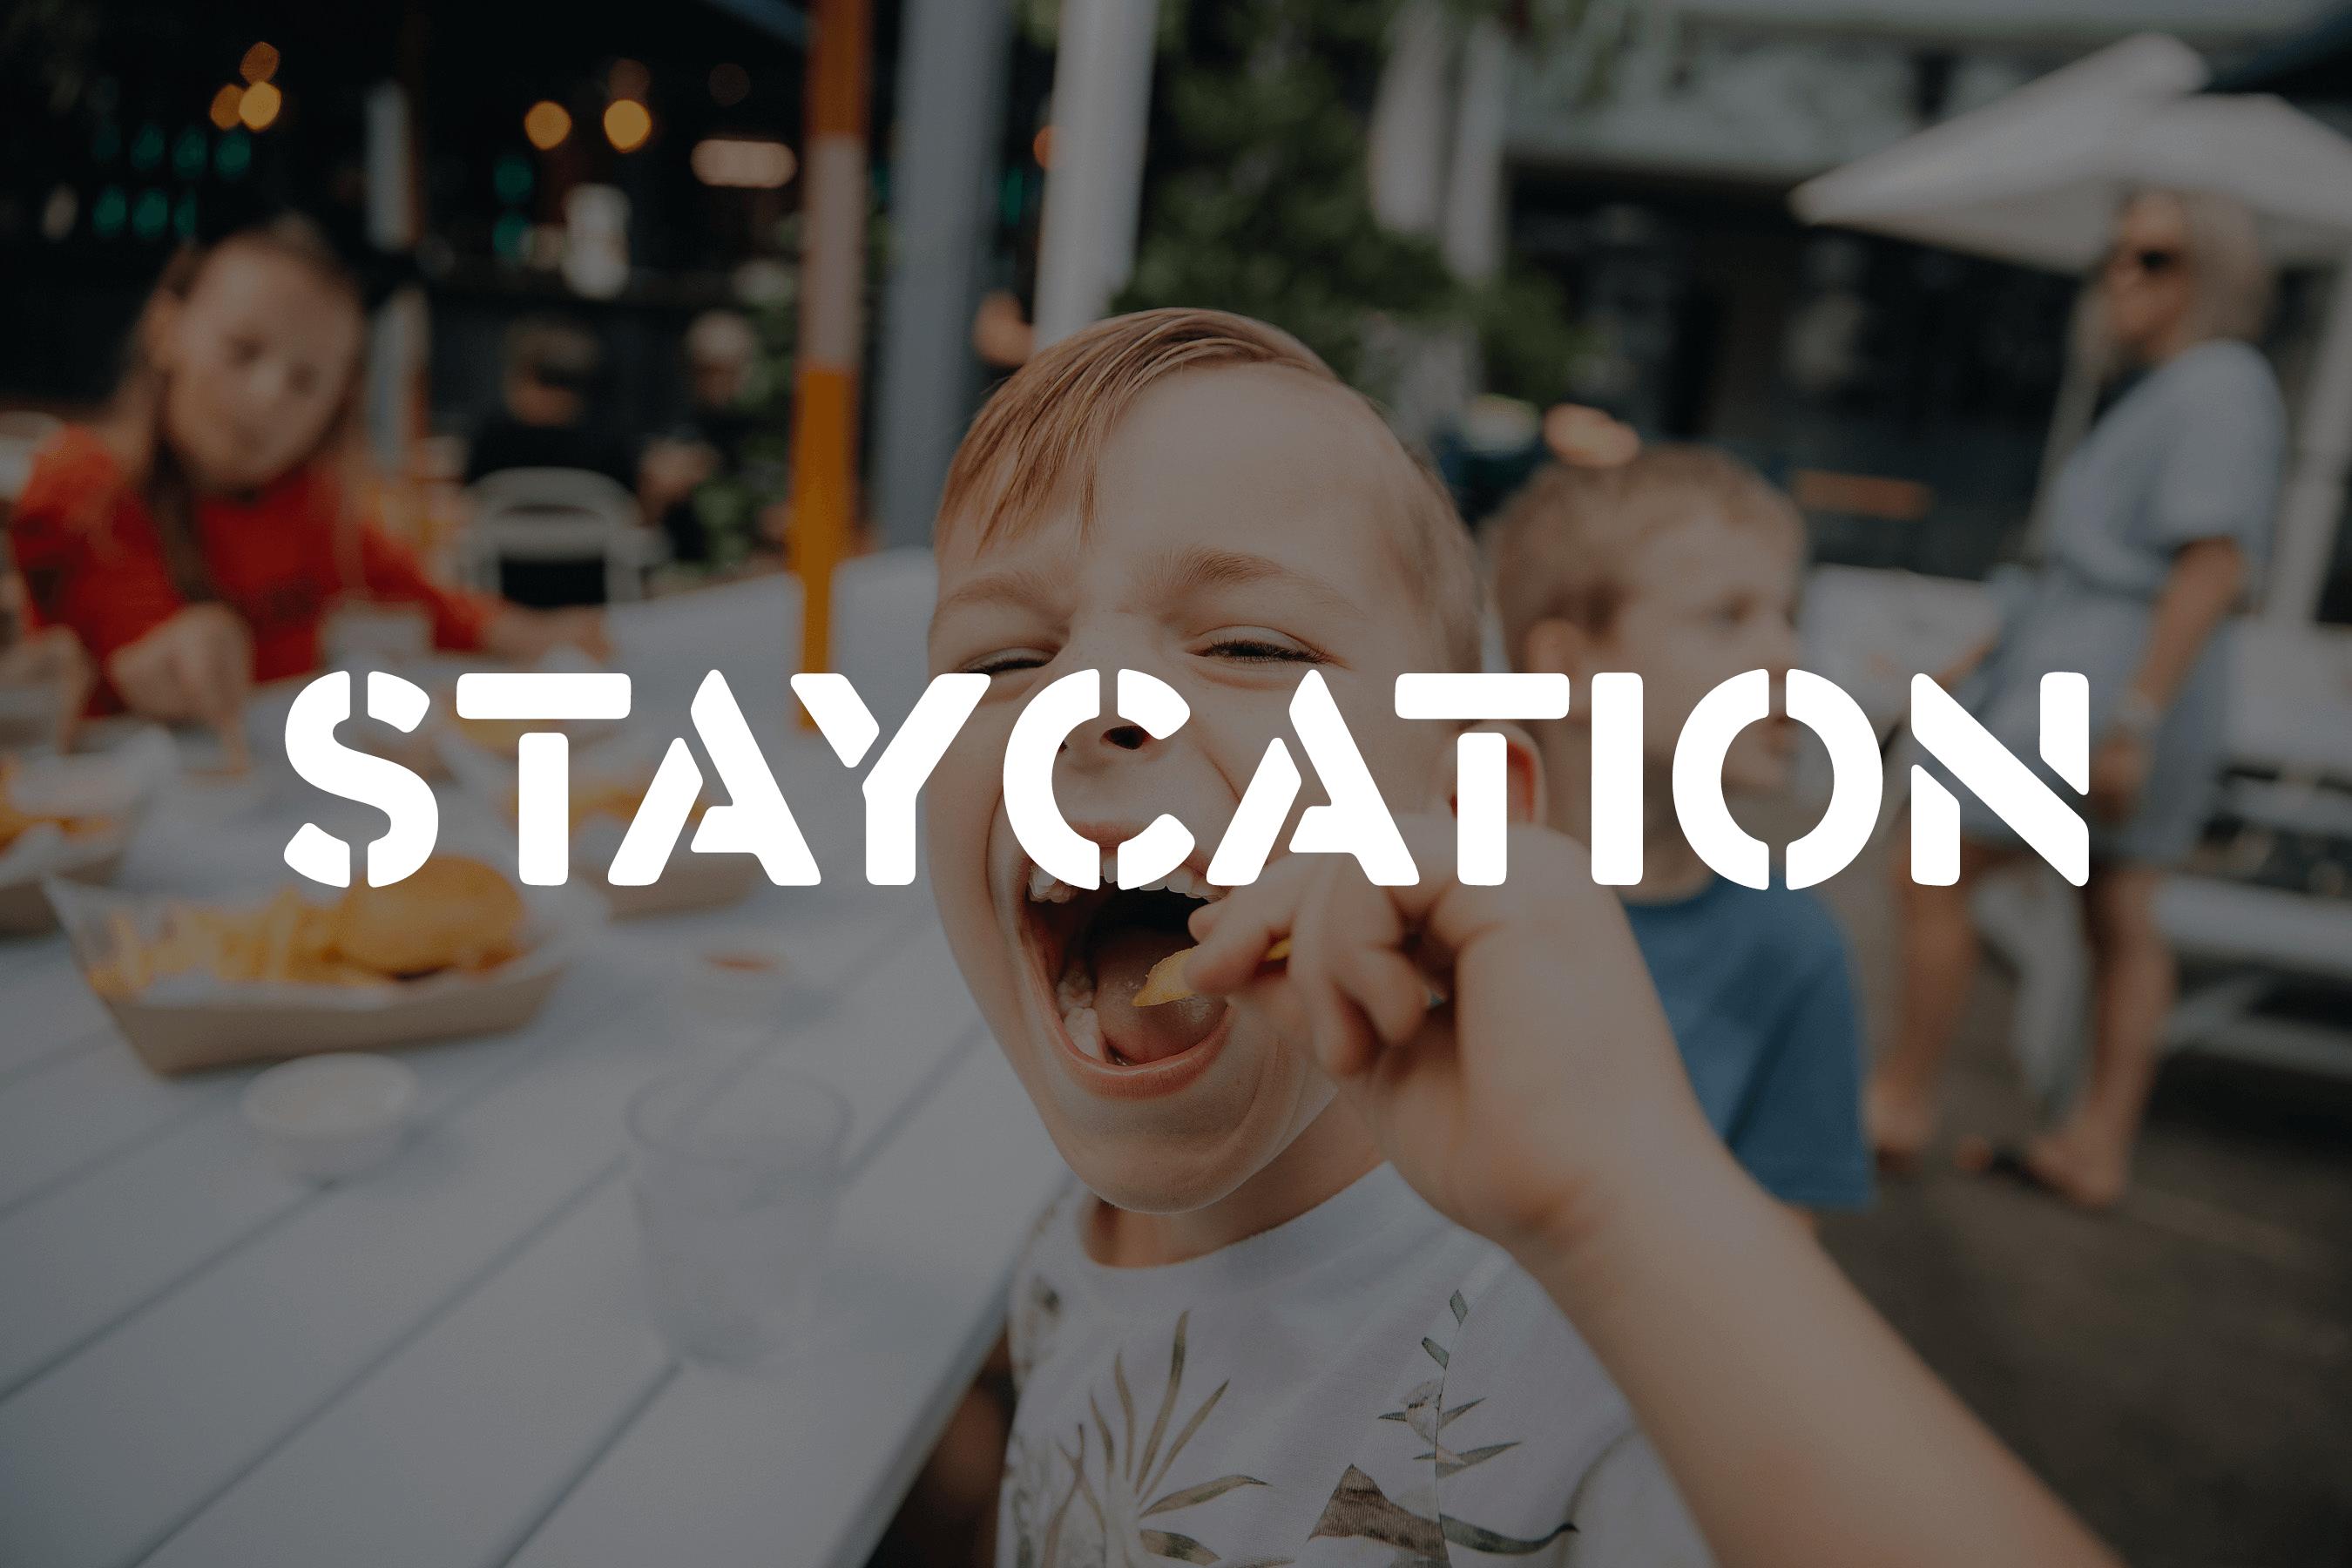 Staycation at AFM